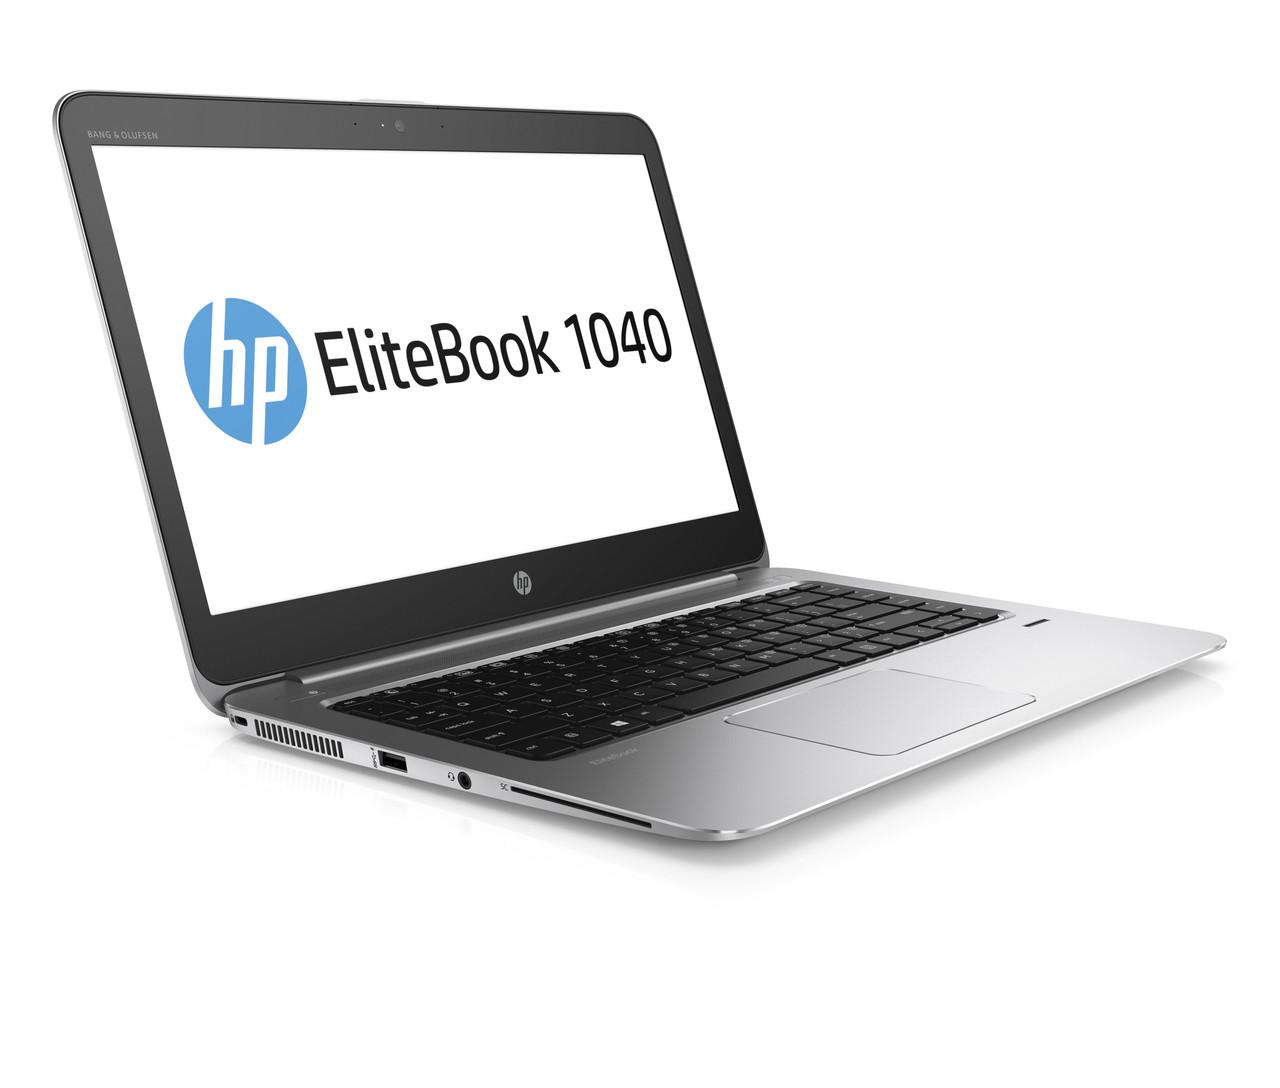 HP EliteBook 1040 G4 Touch W10P-64 i7 7600U 2 8GHz 512GB NVME 16GB 14 0FHD  Privacy WLAN BT BL FPR No-NFC Cam